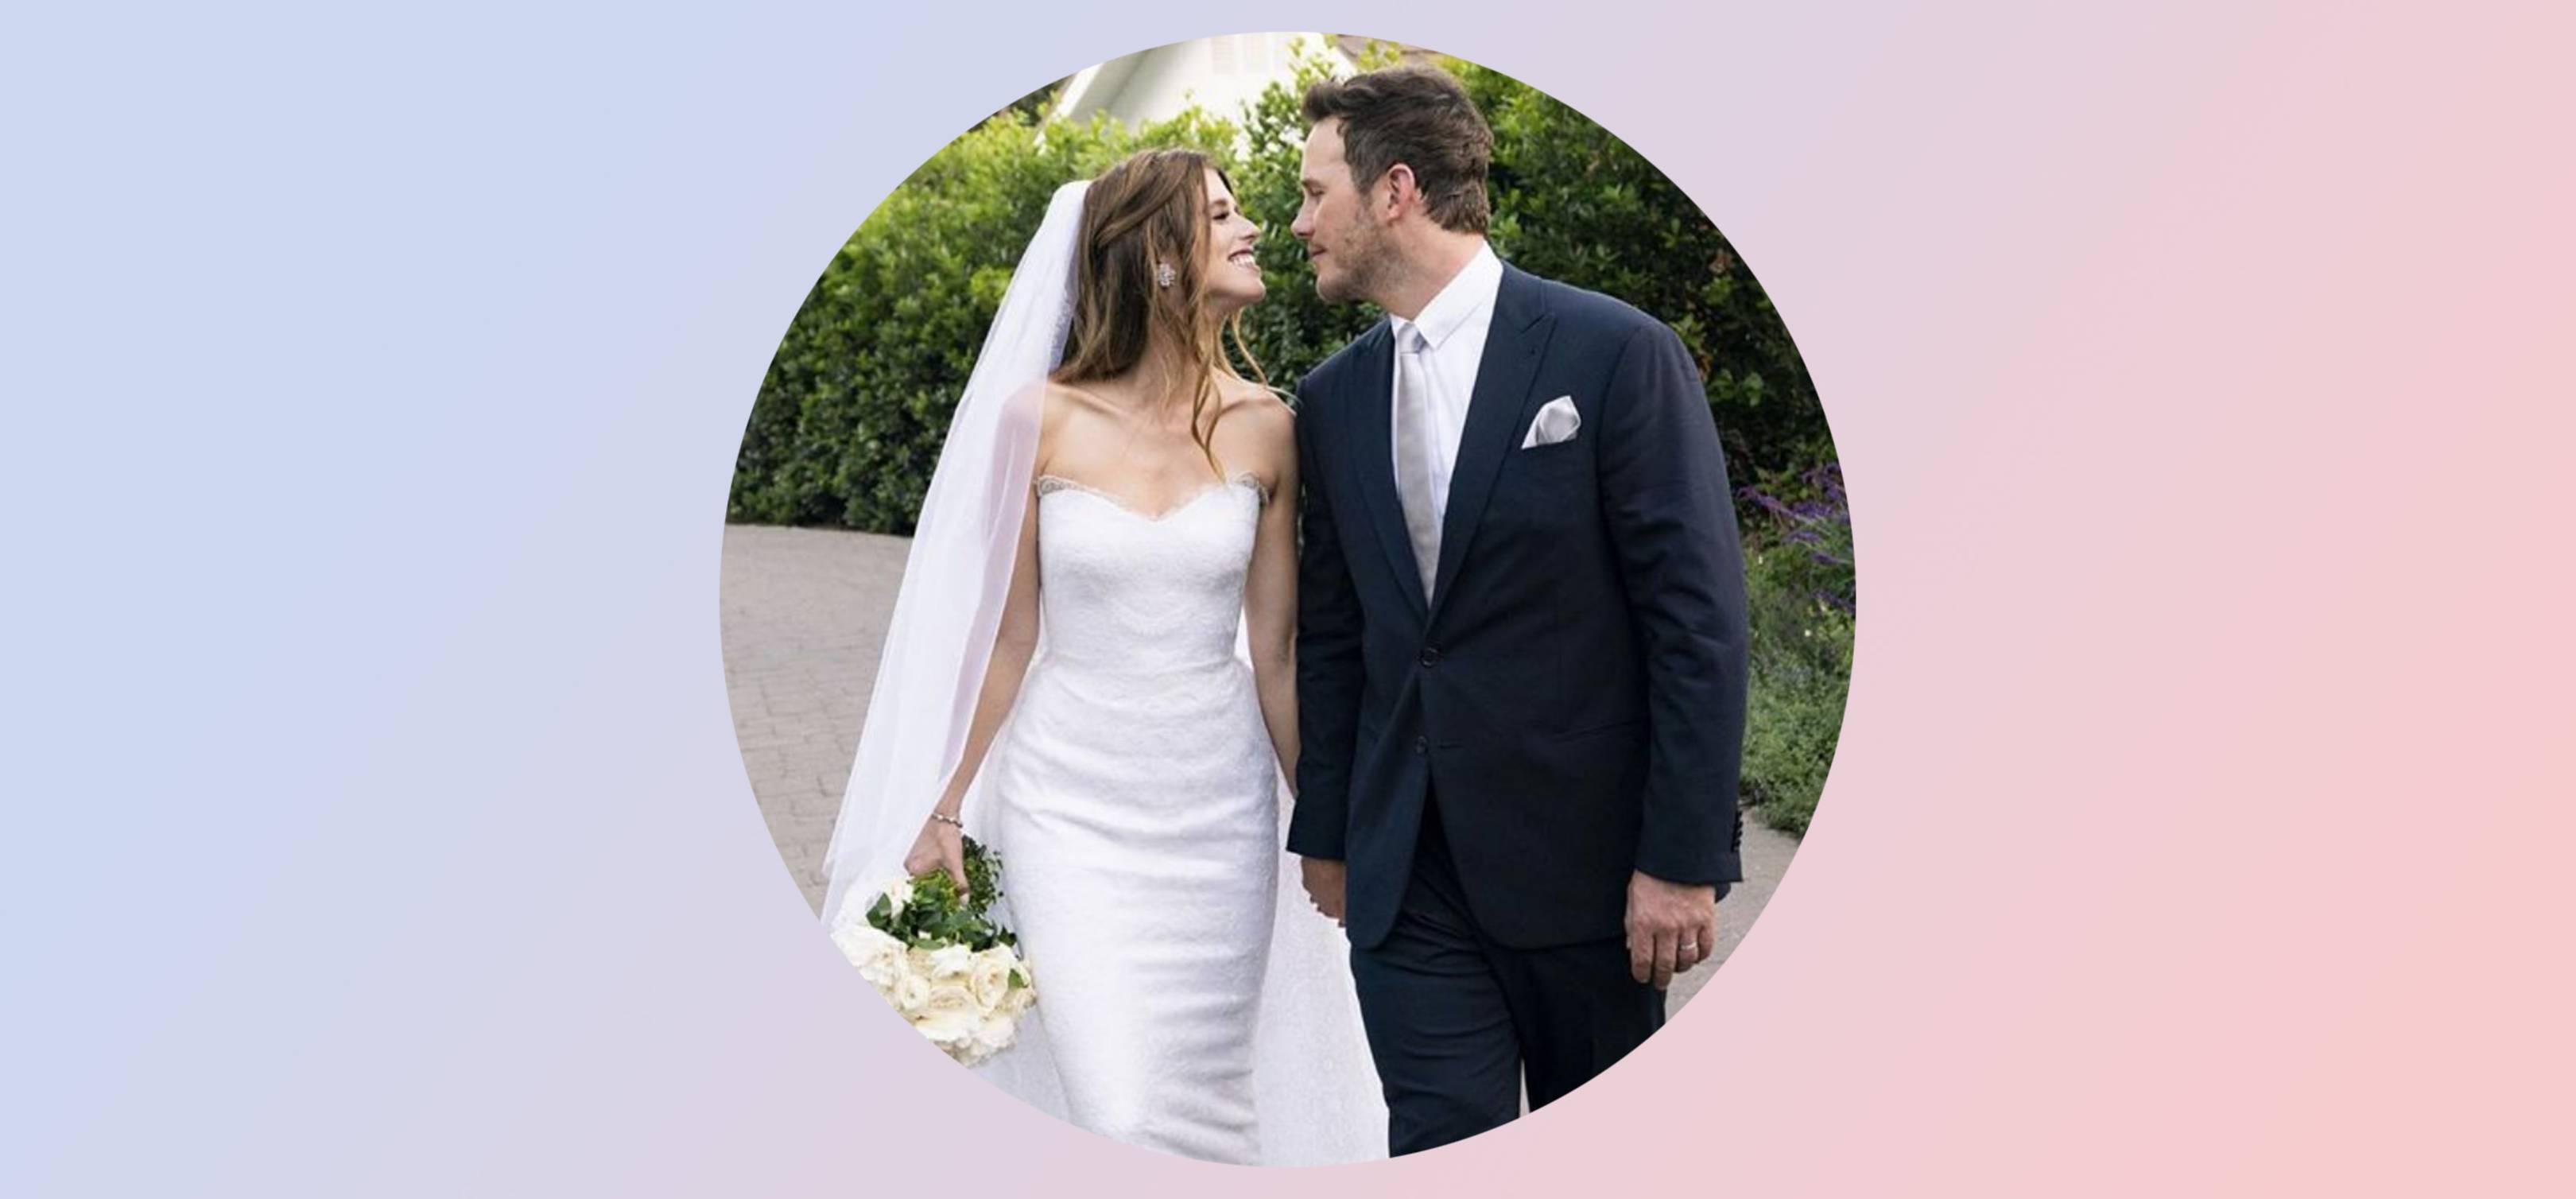 Celebrity weddings that will make you feel all warm 'n' fuzzy inside